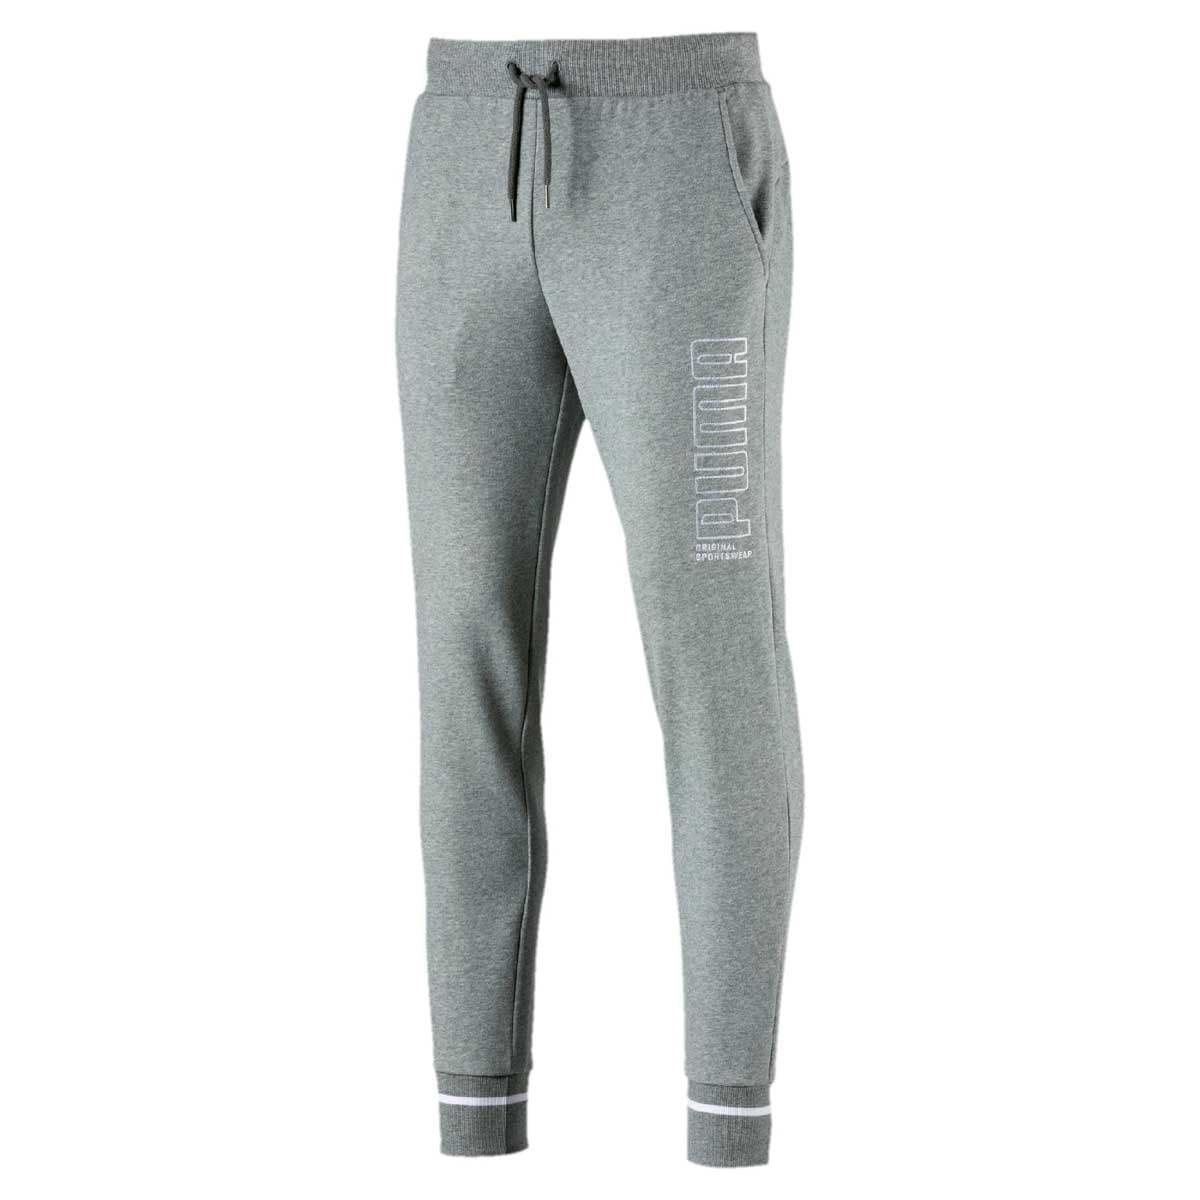 Pants Athletics Pants Tr Cl Puma - Caballero